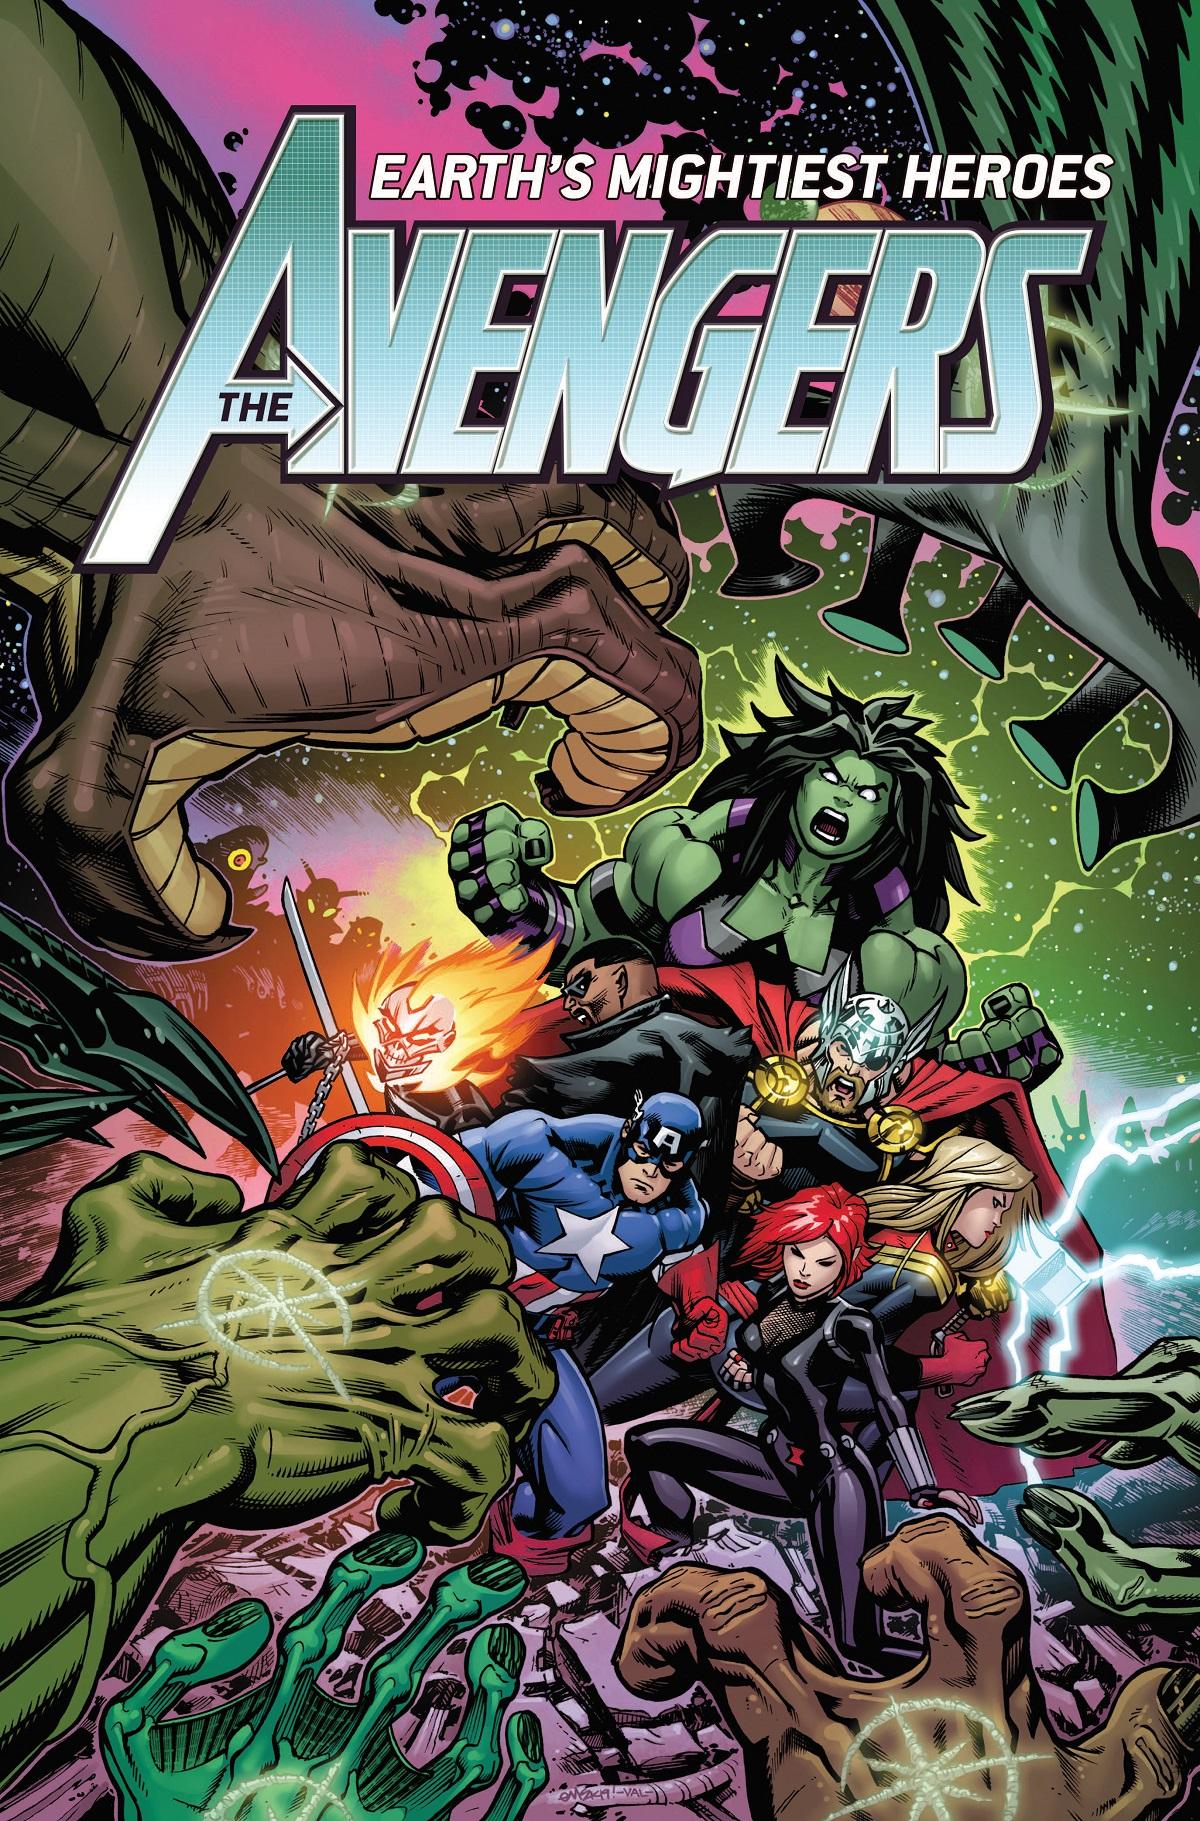 Avengers By Jason Aaron Vol. 6: Starbrand Reborn (Trade Paperback)